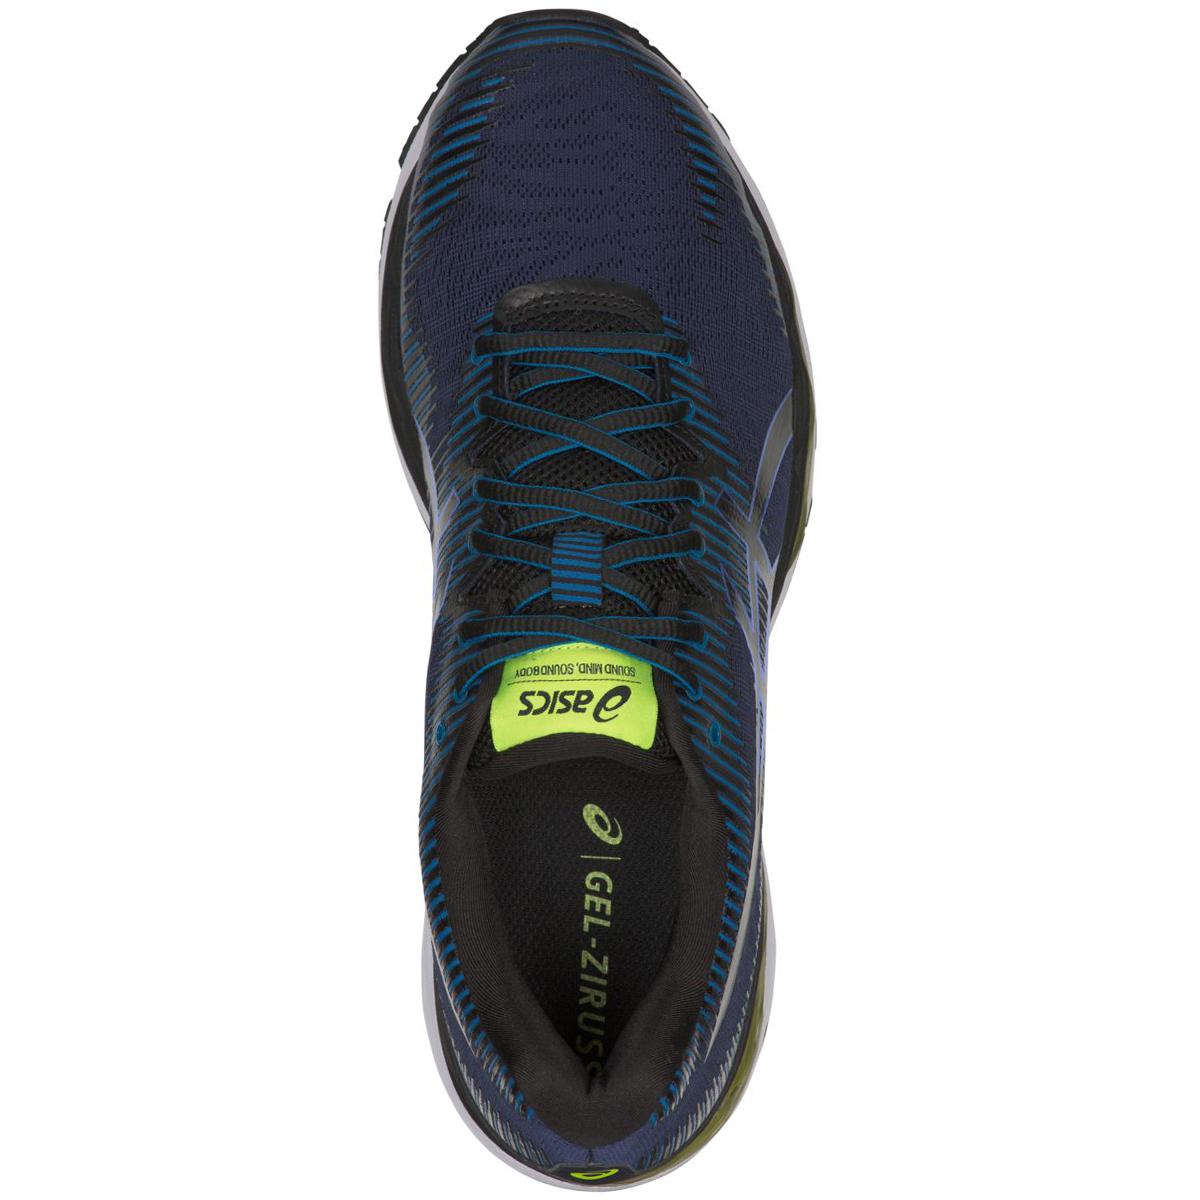 ASICS Men's Gel Ziruss 2 Running Shoes